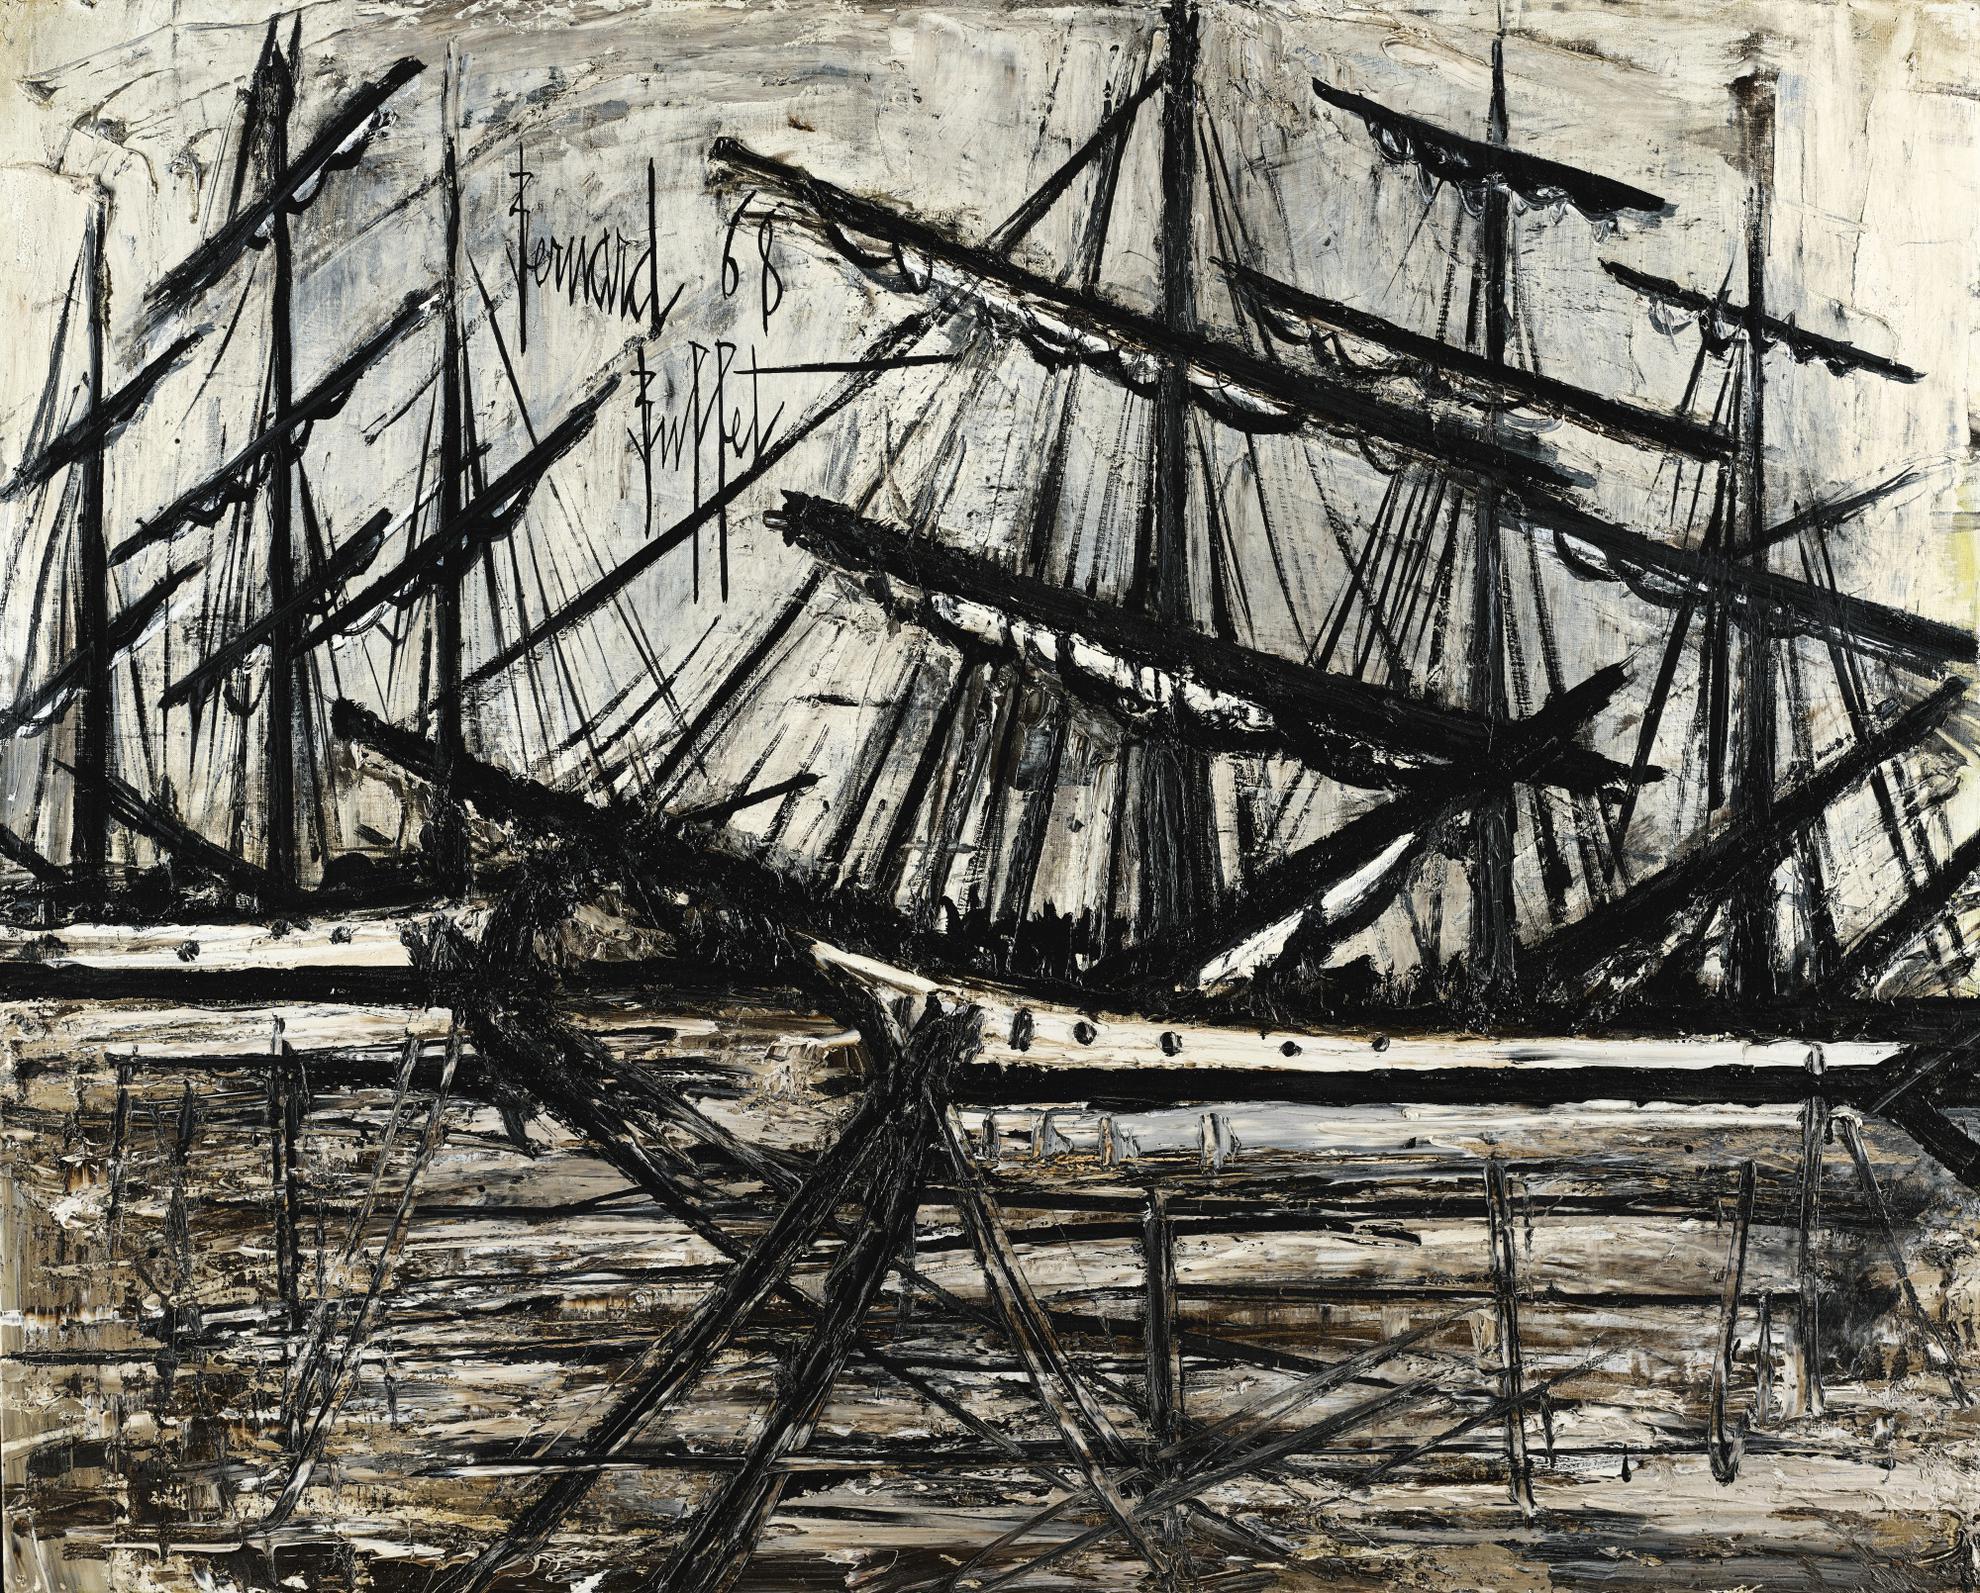 Bernard Buffet-Terre-Neuvas Dans Le Bassin A Saint-Malo-1968